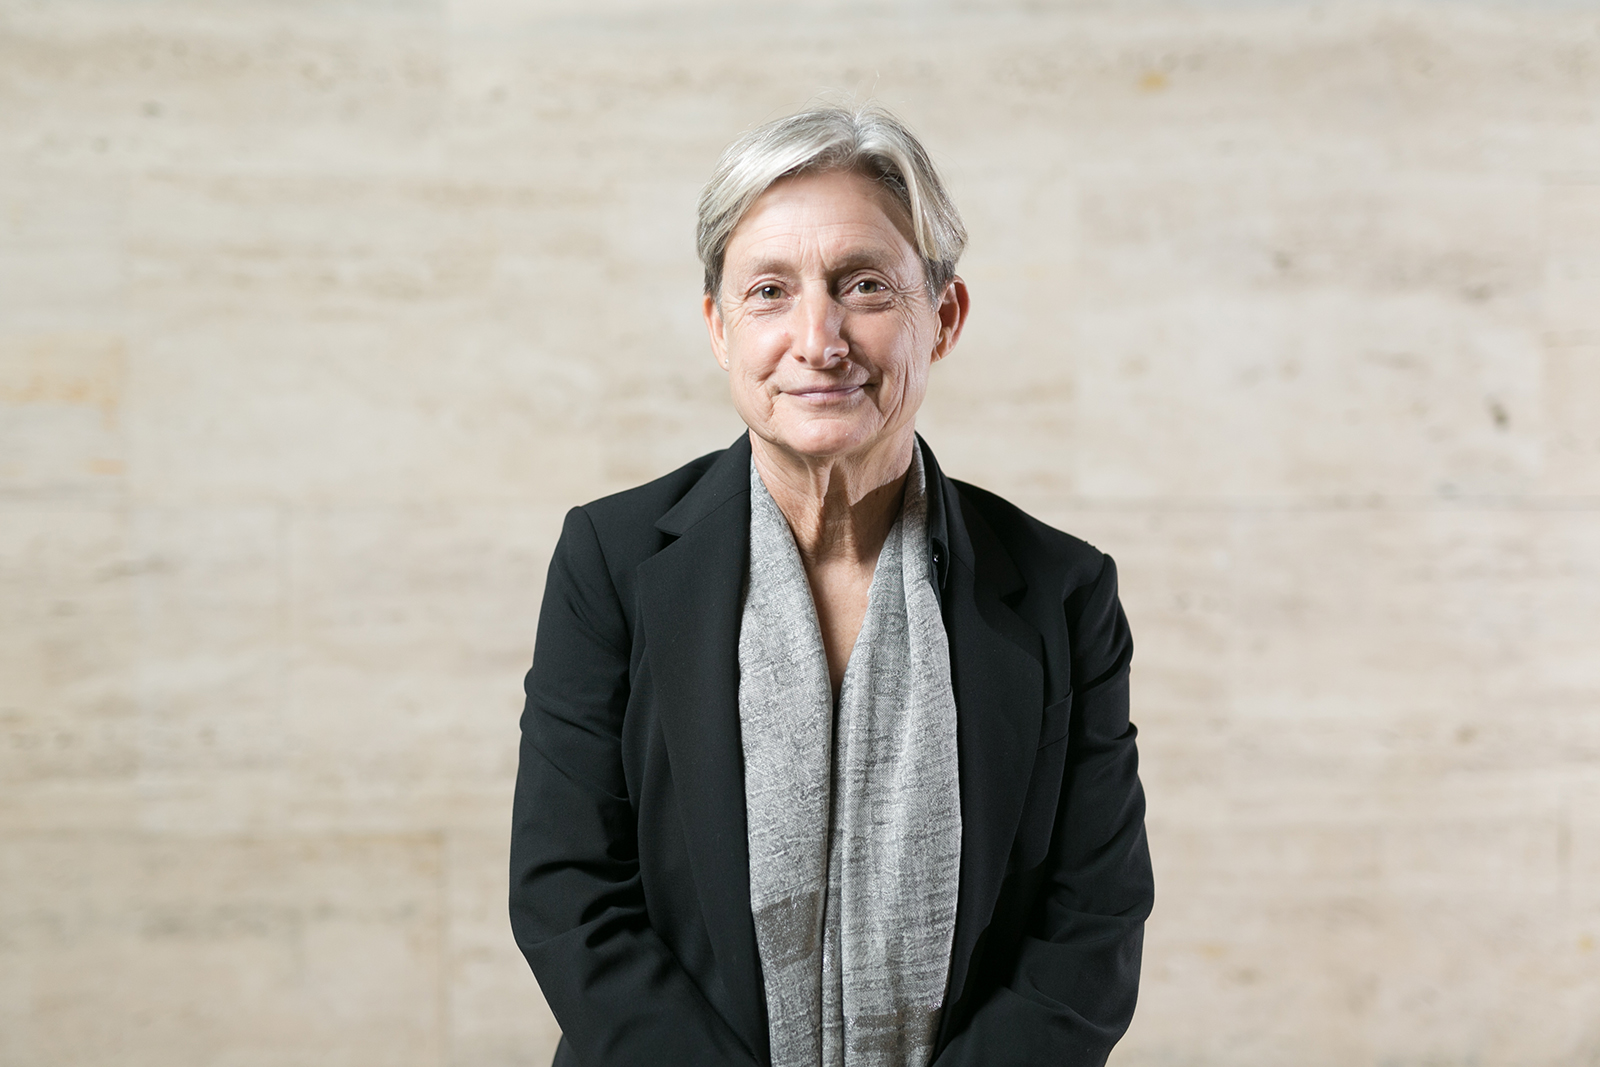 La filósofa estadounidense Judith Butler. WIKIPEDIA